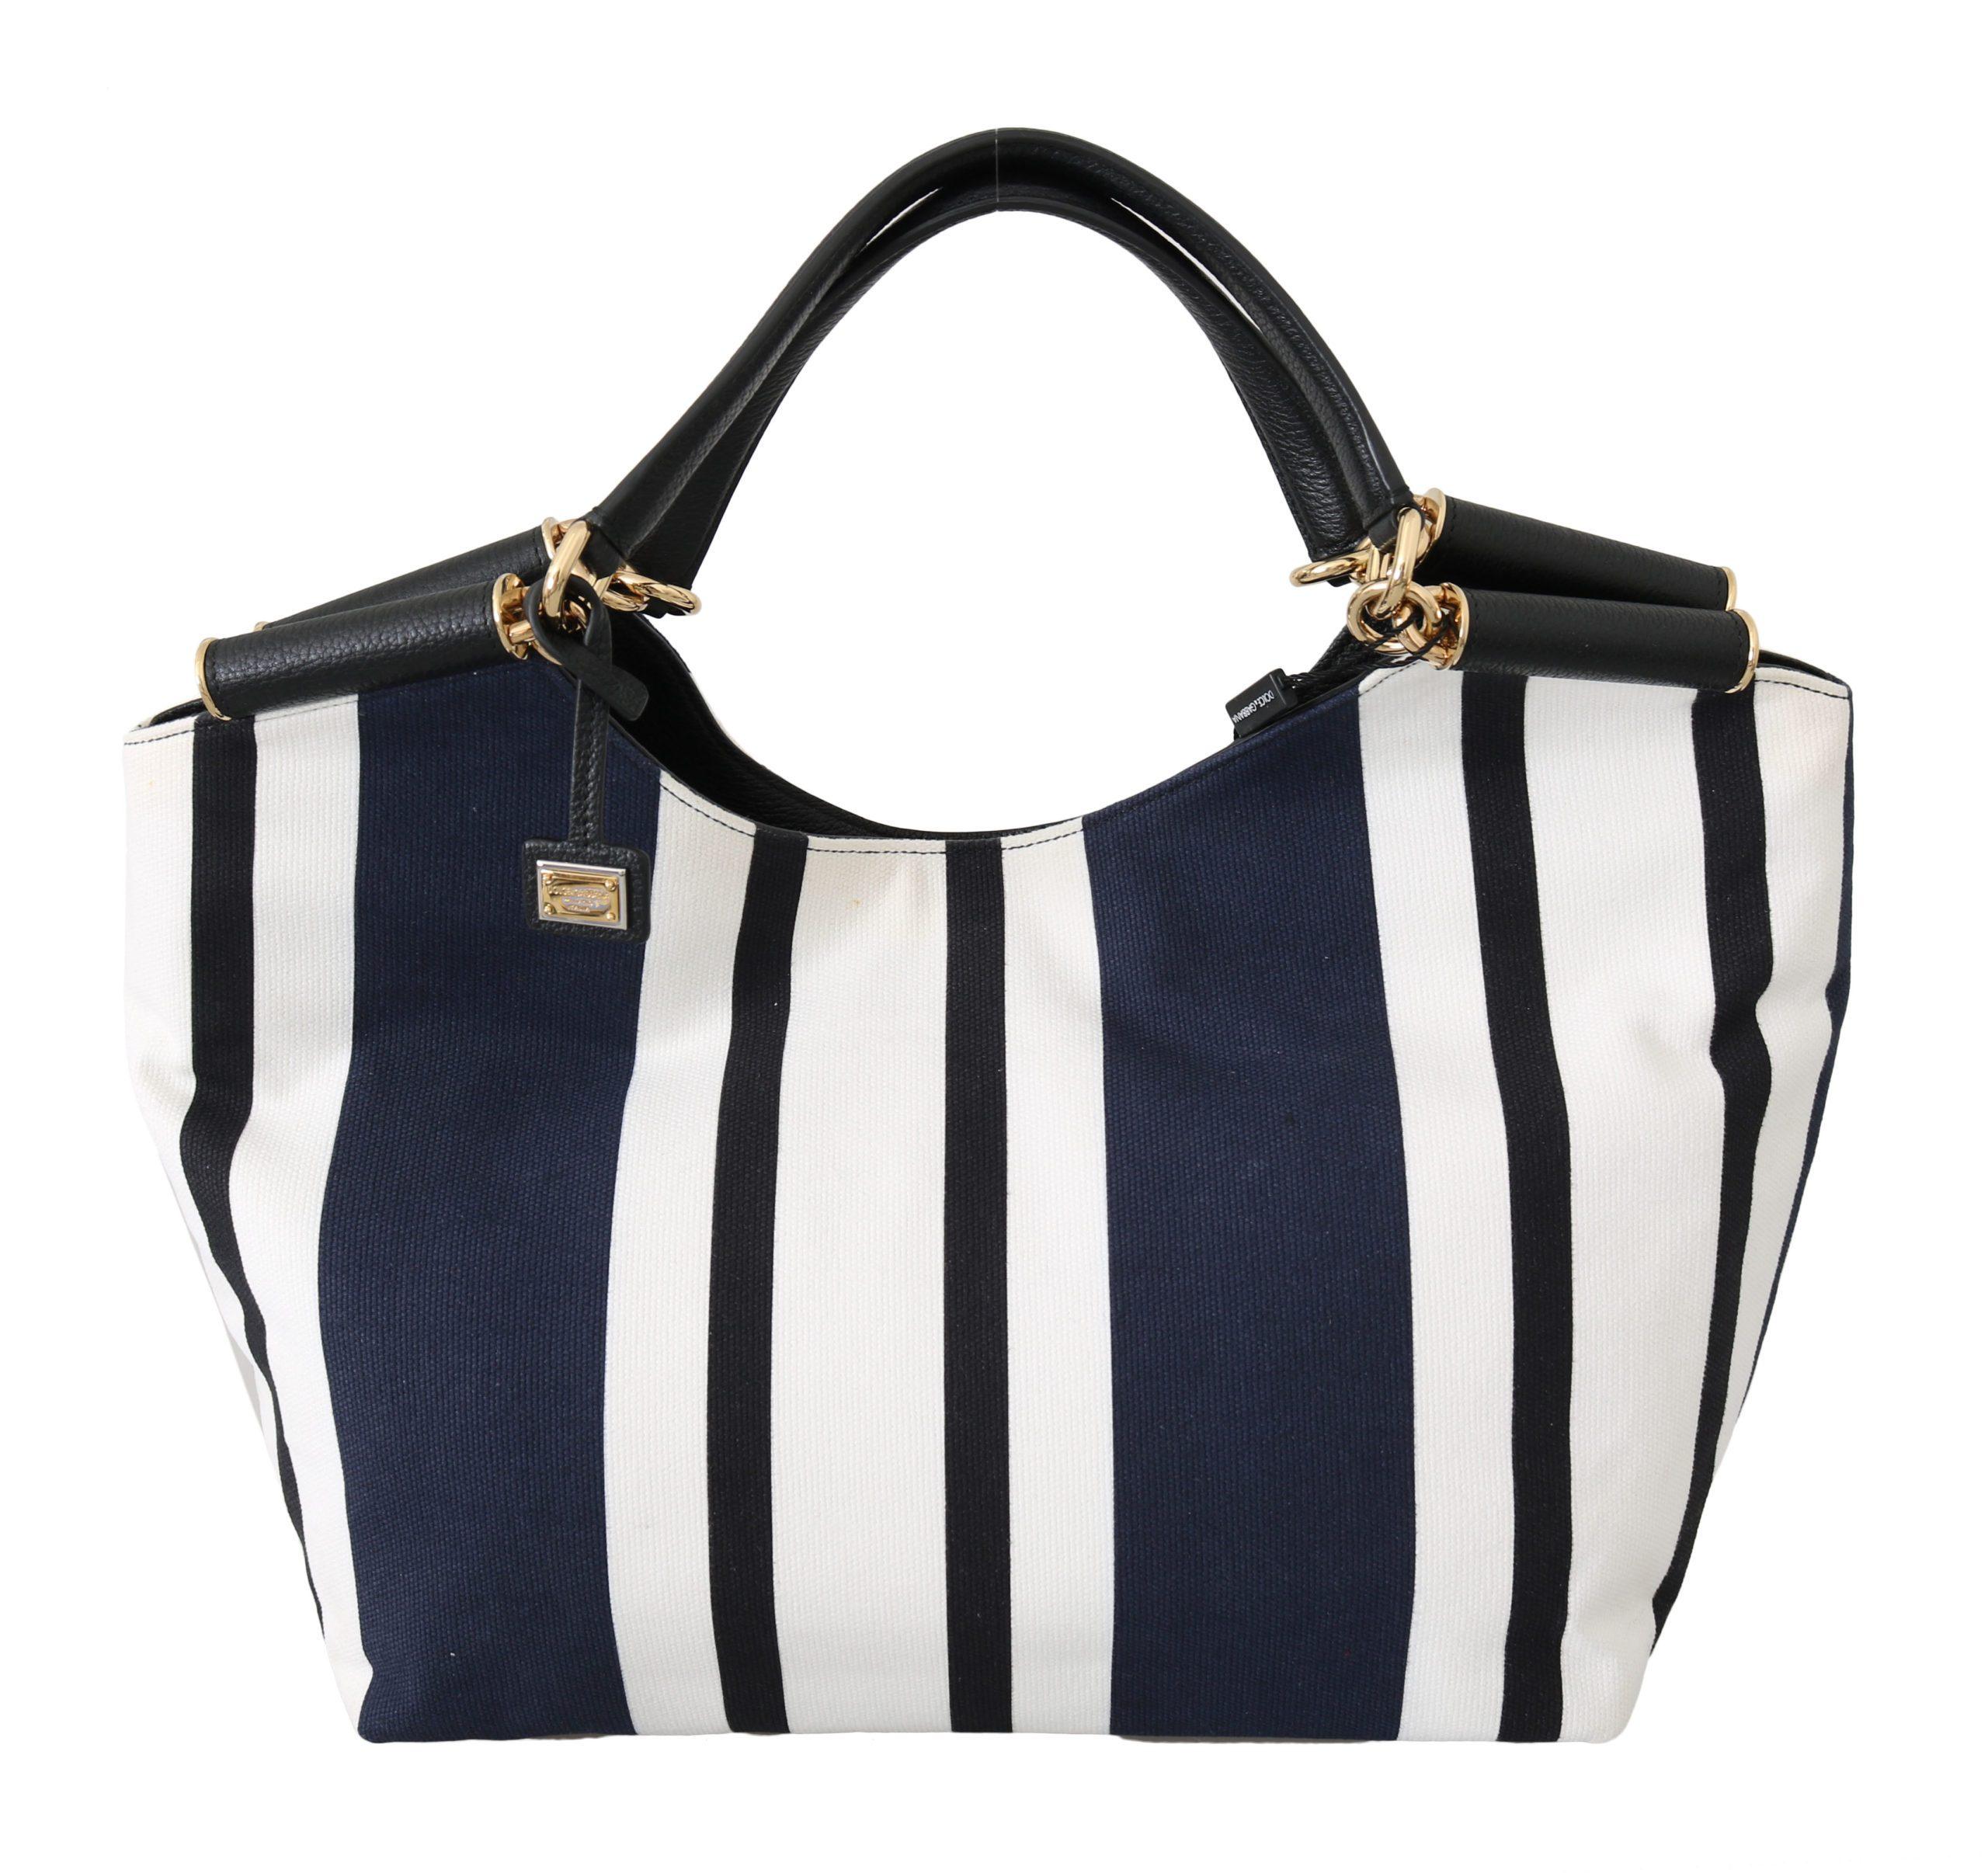 Dolce & Gabbana Women's Stripes Cotton Tote Bag Multicolor VAS8707